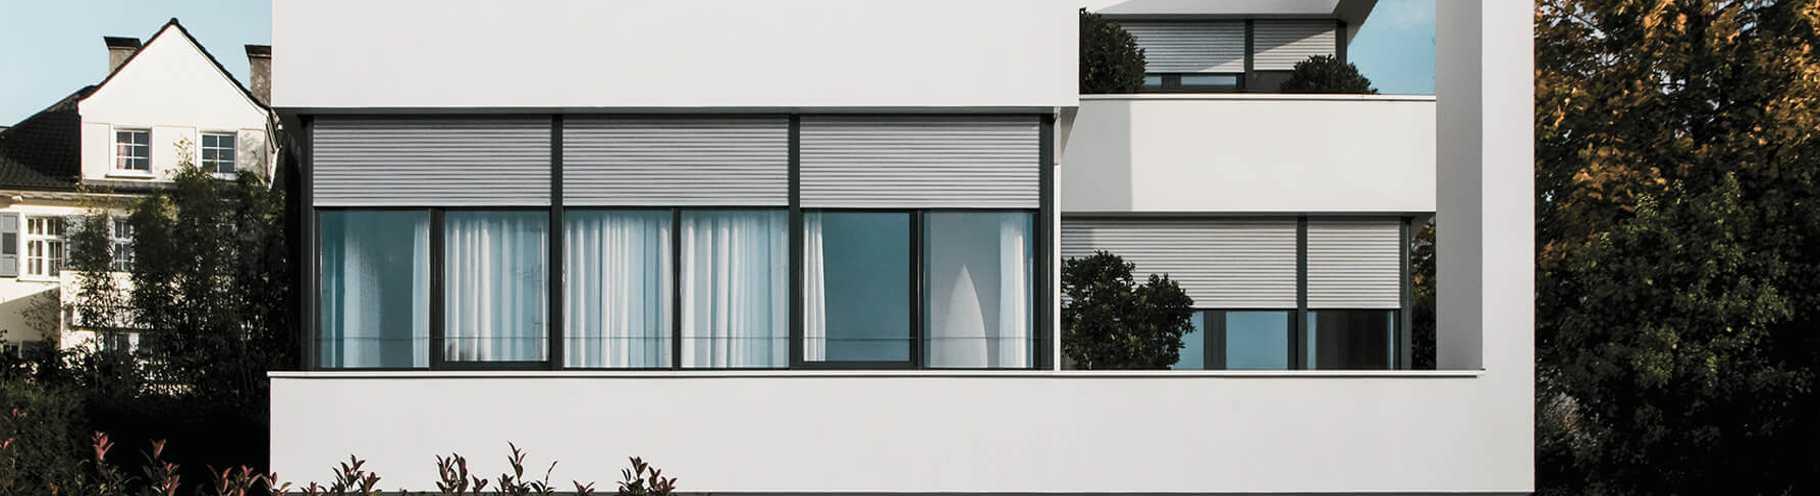 Fensterbau Düren